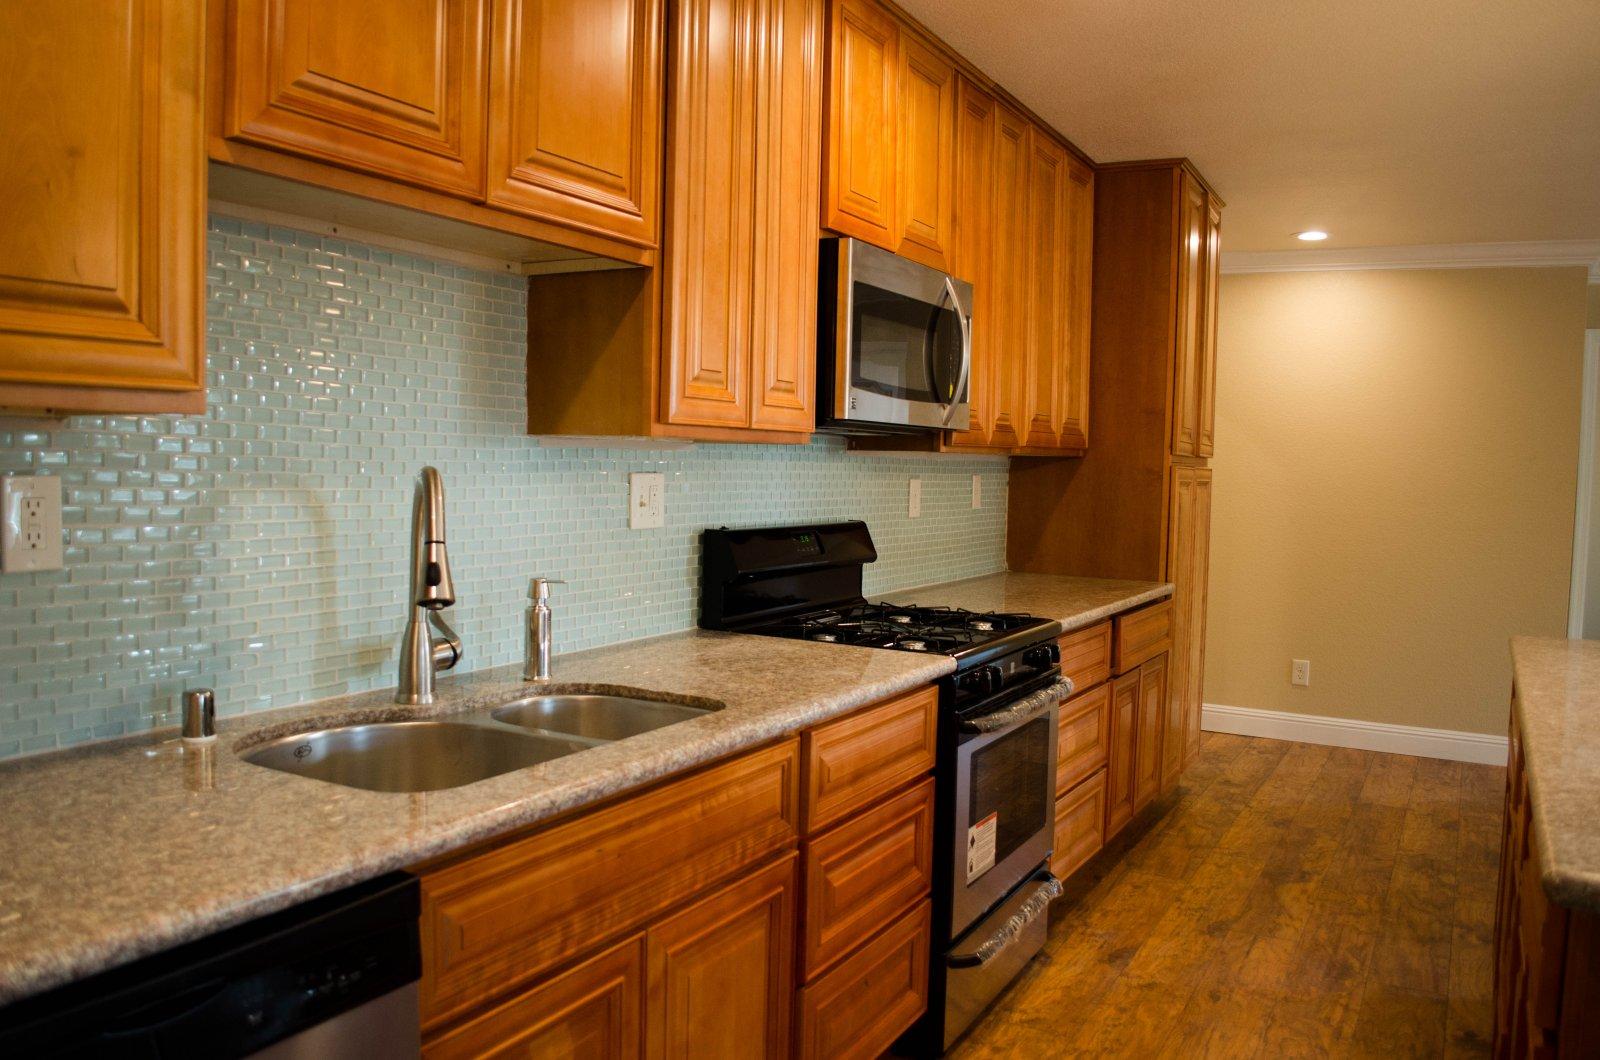 Newly Remodeled Kitchen Stockton